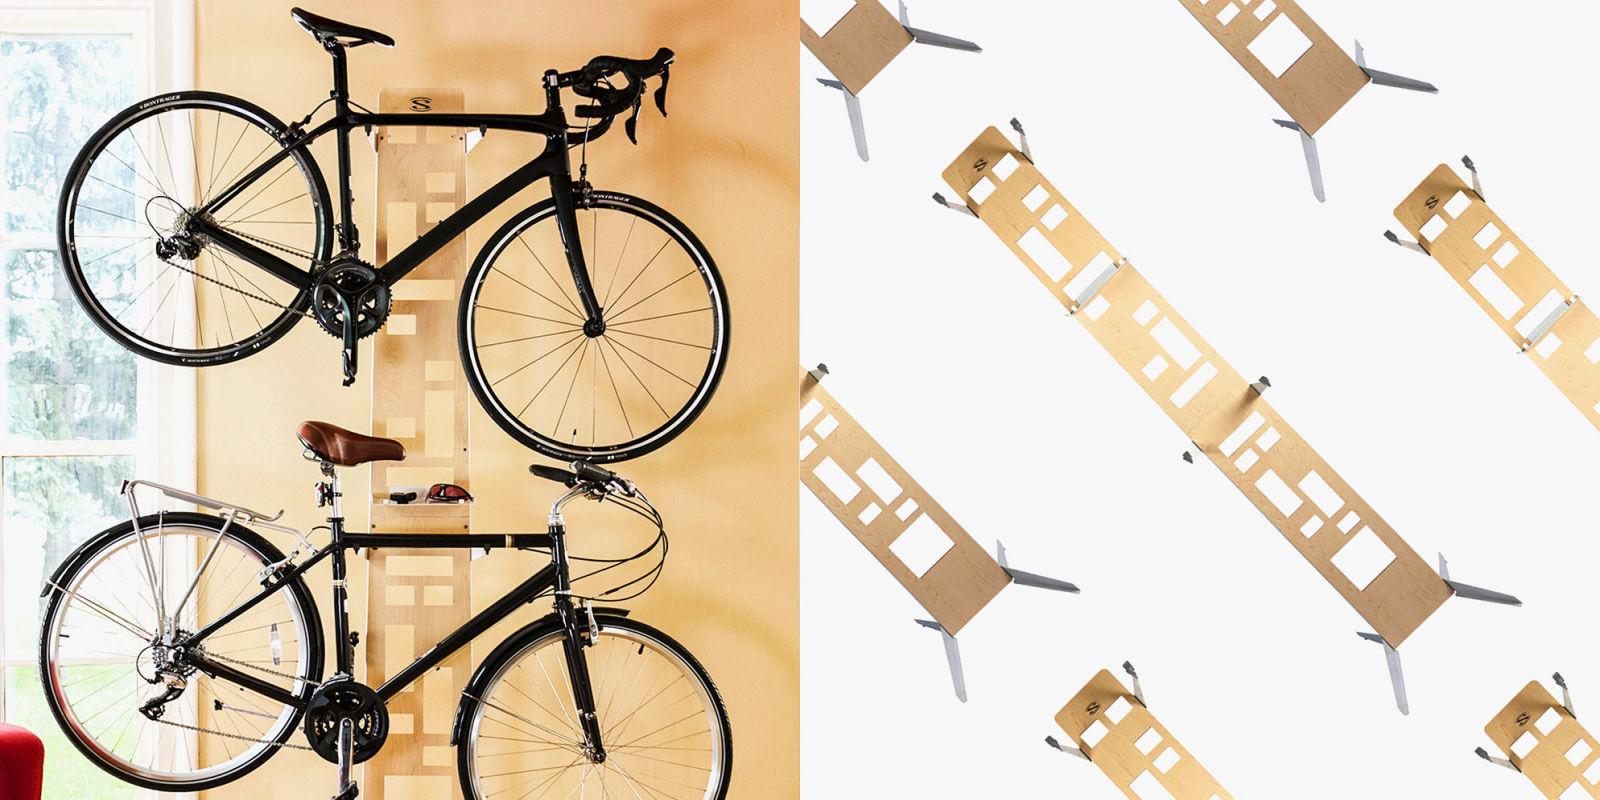 11 best bike storage solutions in 2017 useful bike storage ideas